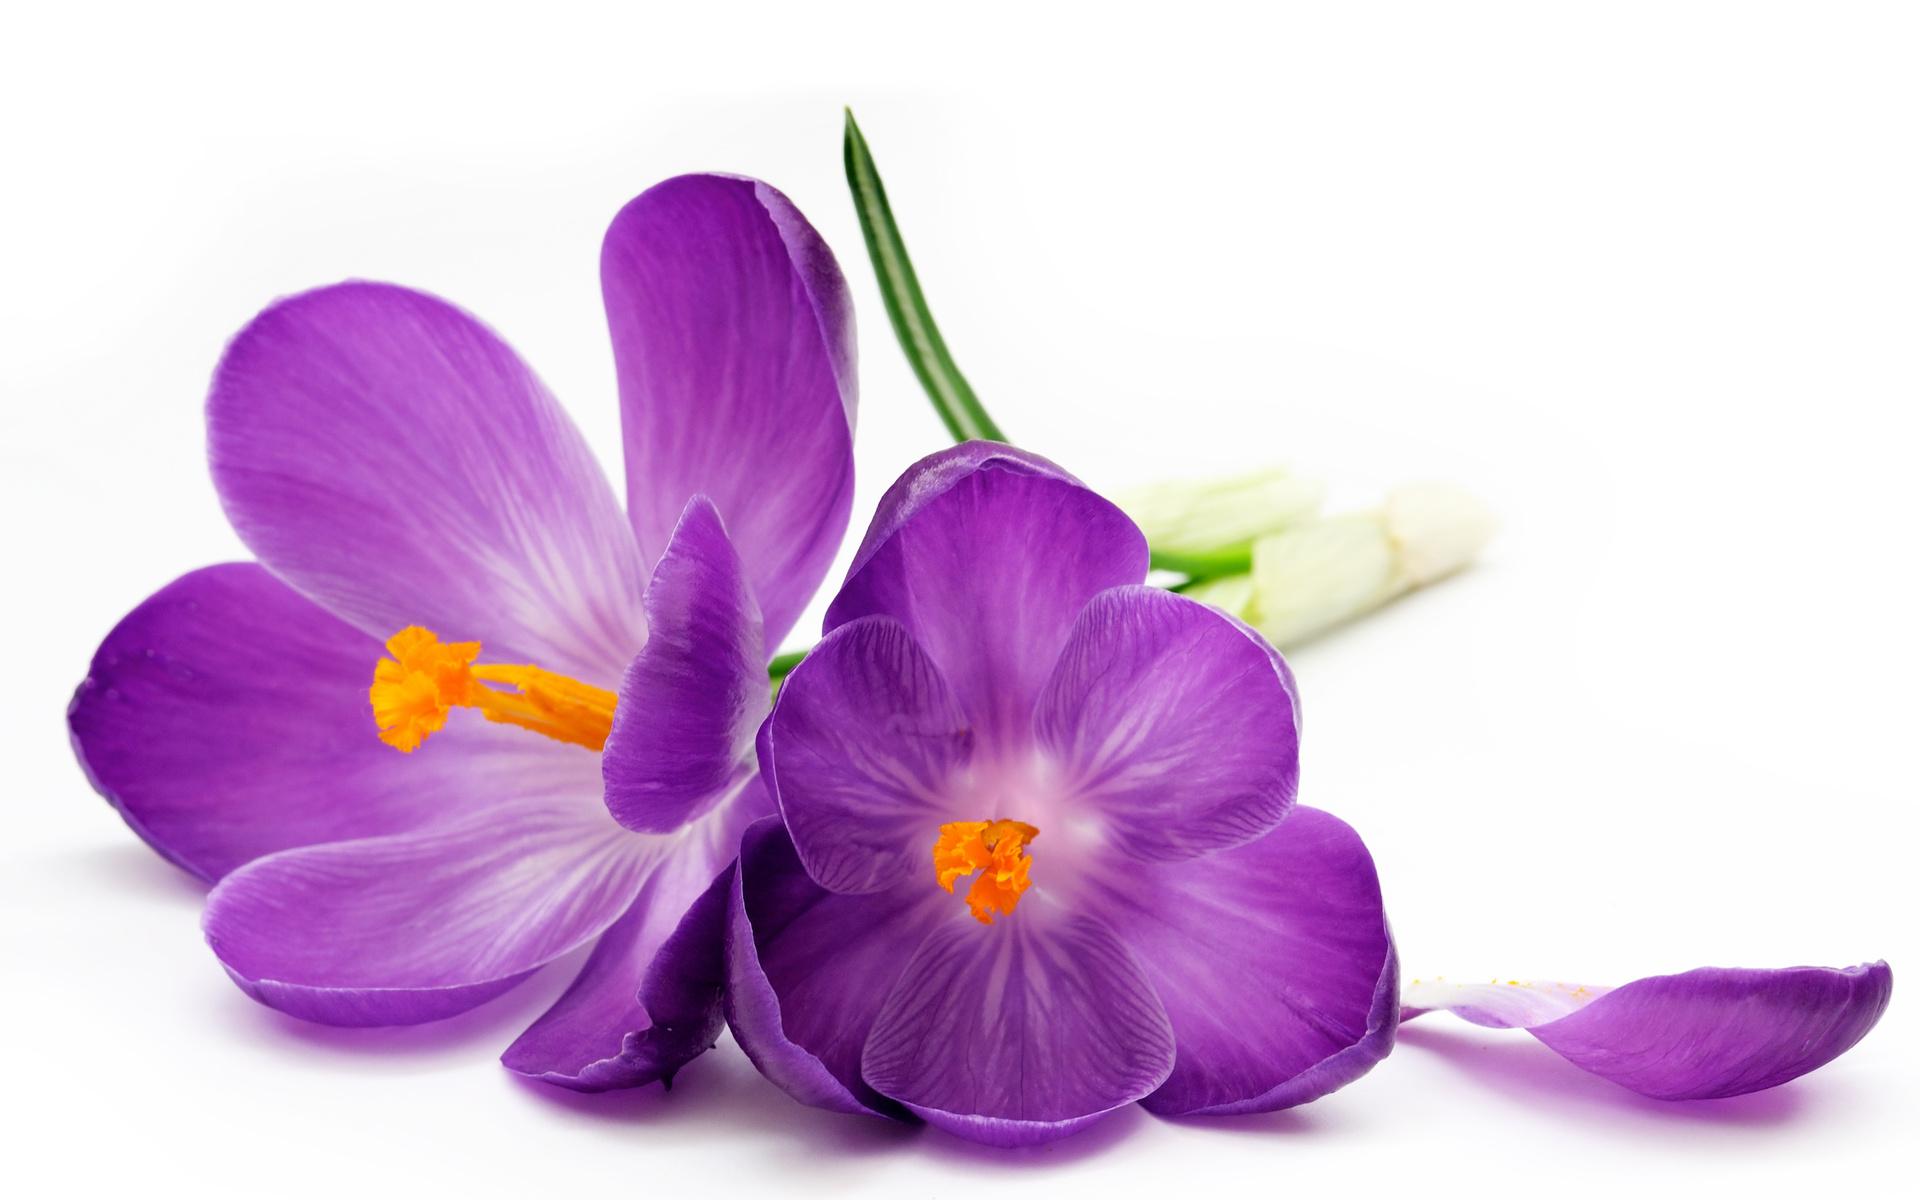 крокусы, фиолет, белый, фон